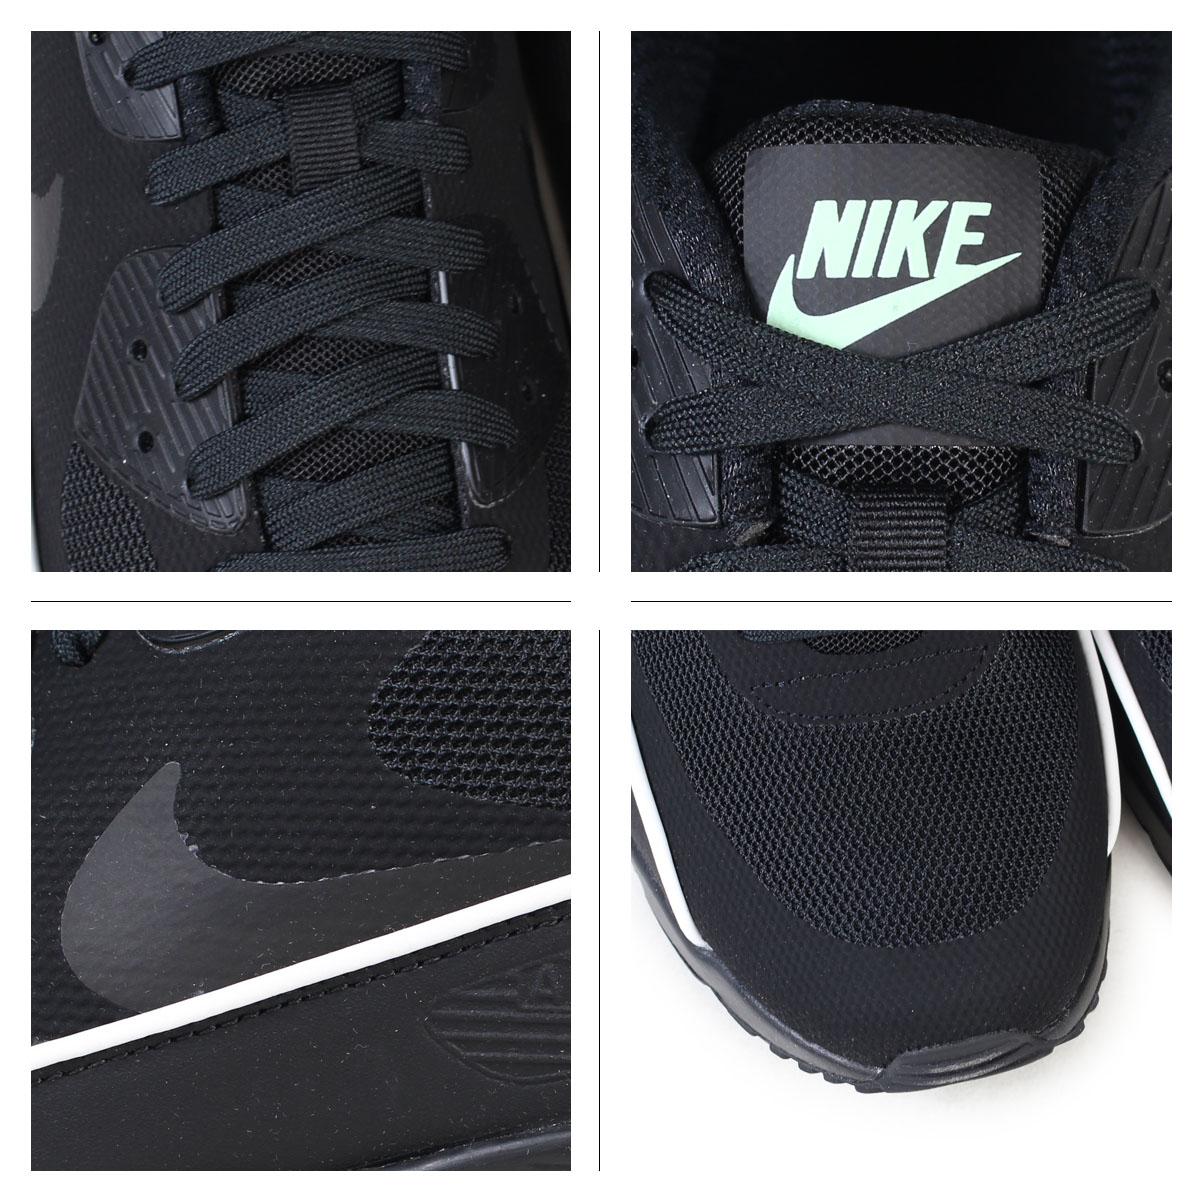 NIKE Kie Ney AMAX 90 essential ultra sneakers AIR MAX 90 ULTRA 2.0 ESSENTIAL 875,695 009 men's shoes black black